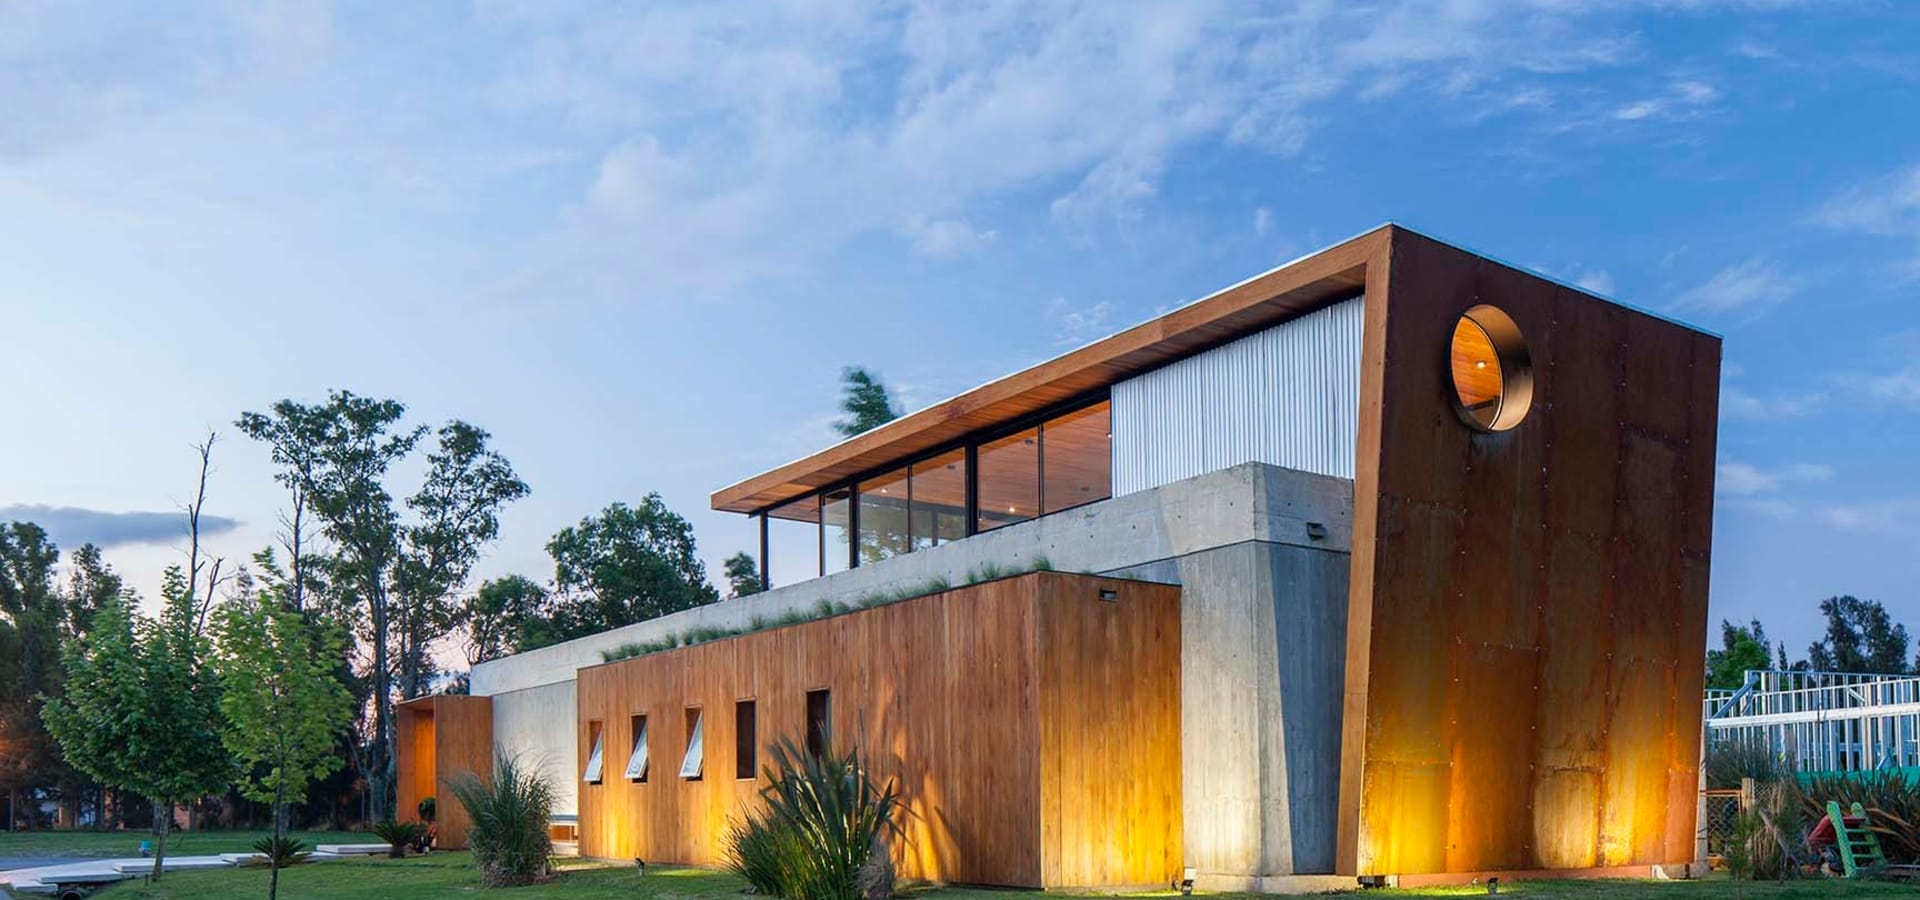 arfuso arquitectos